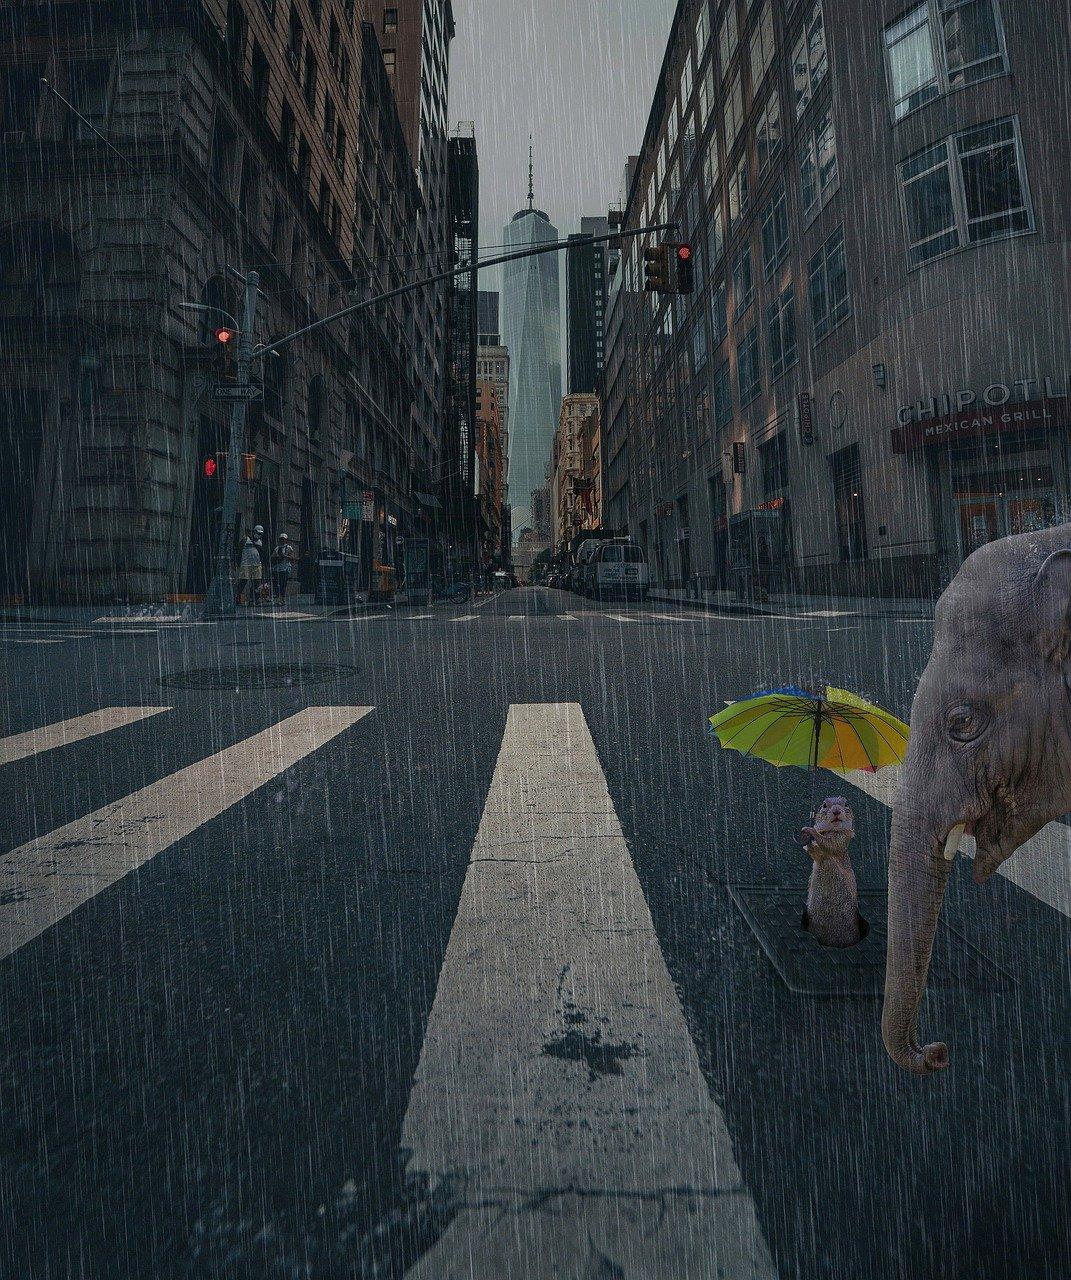 ciudad, calle, lluvia